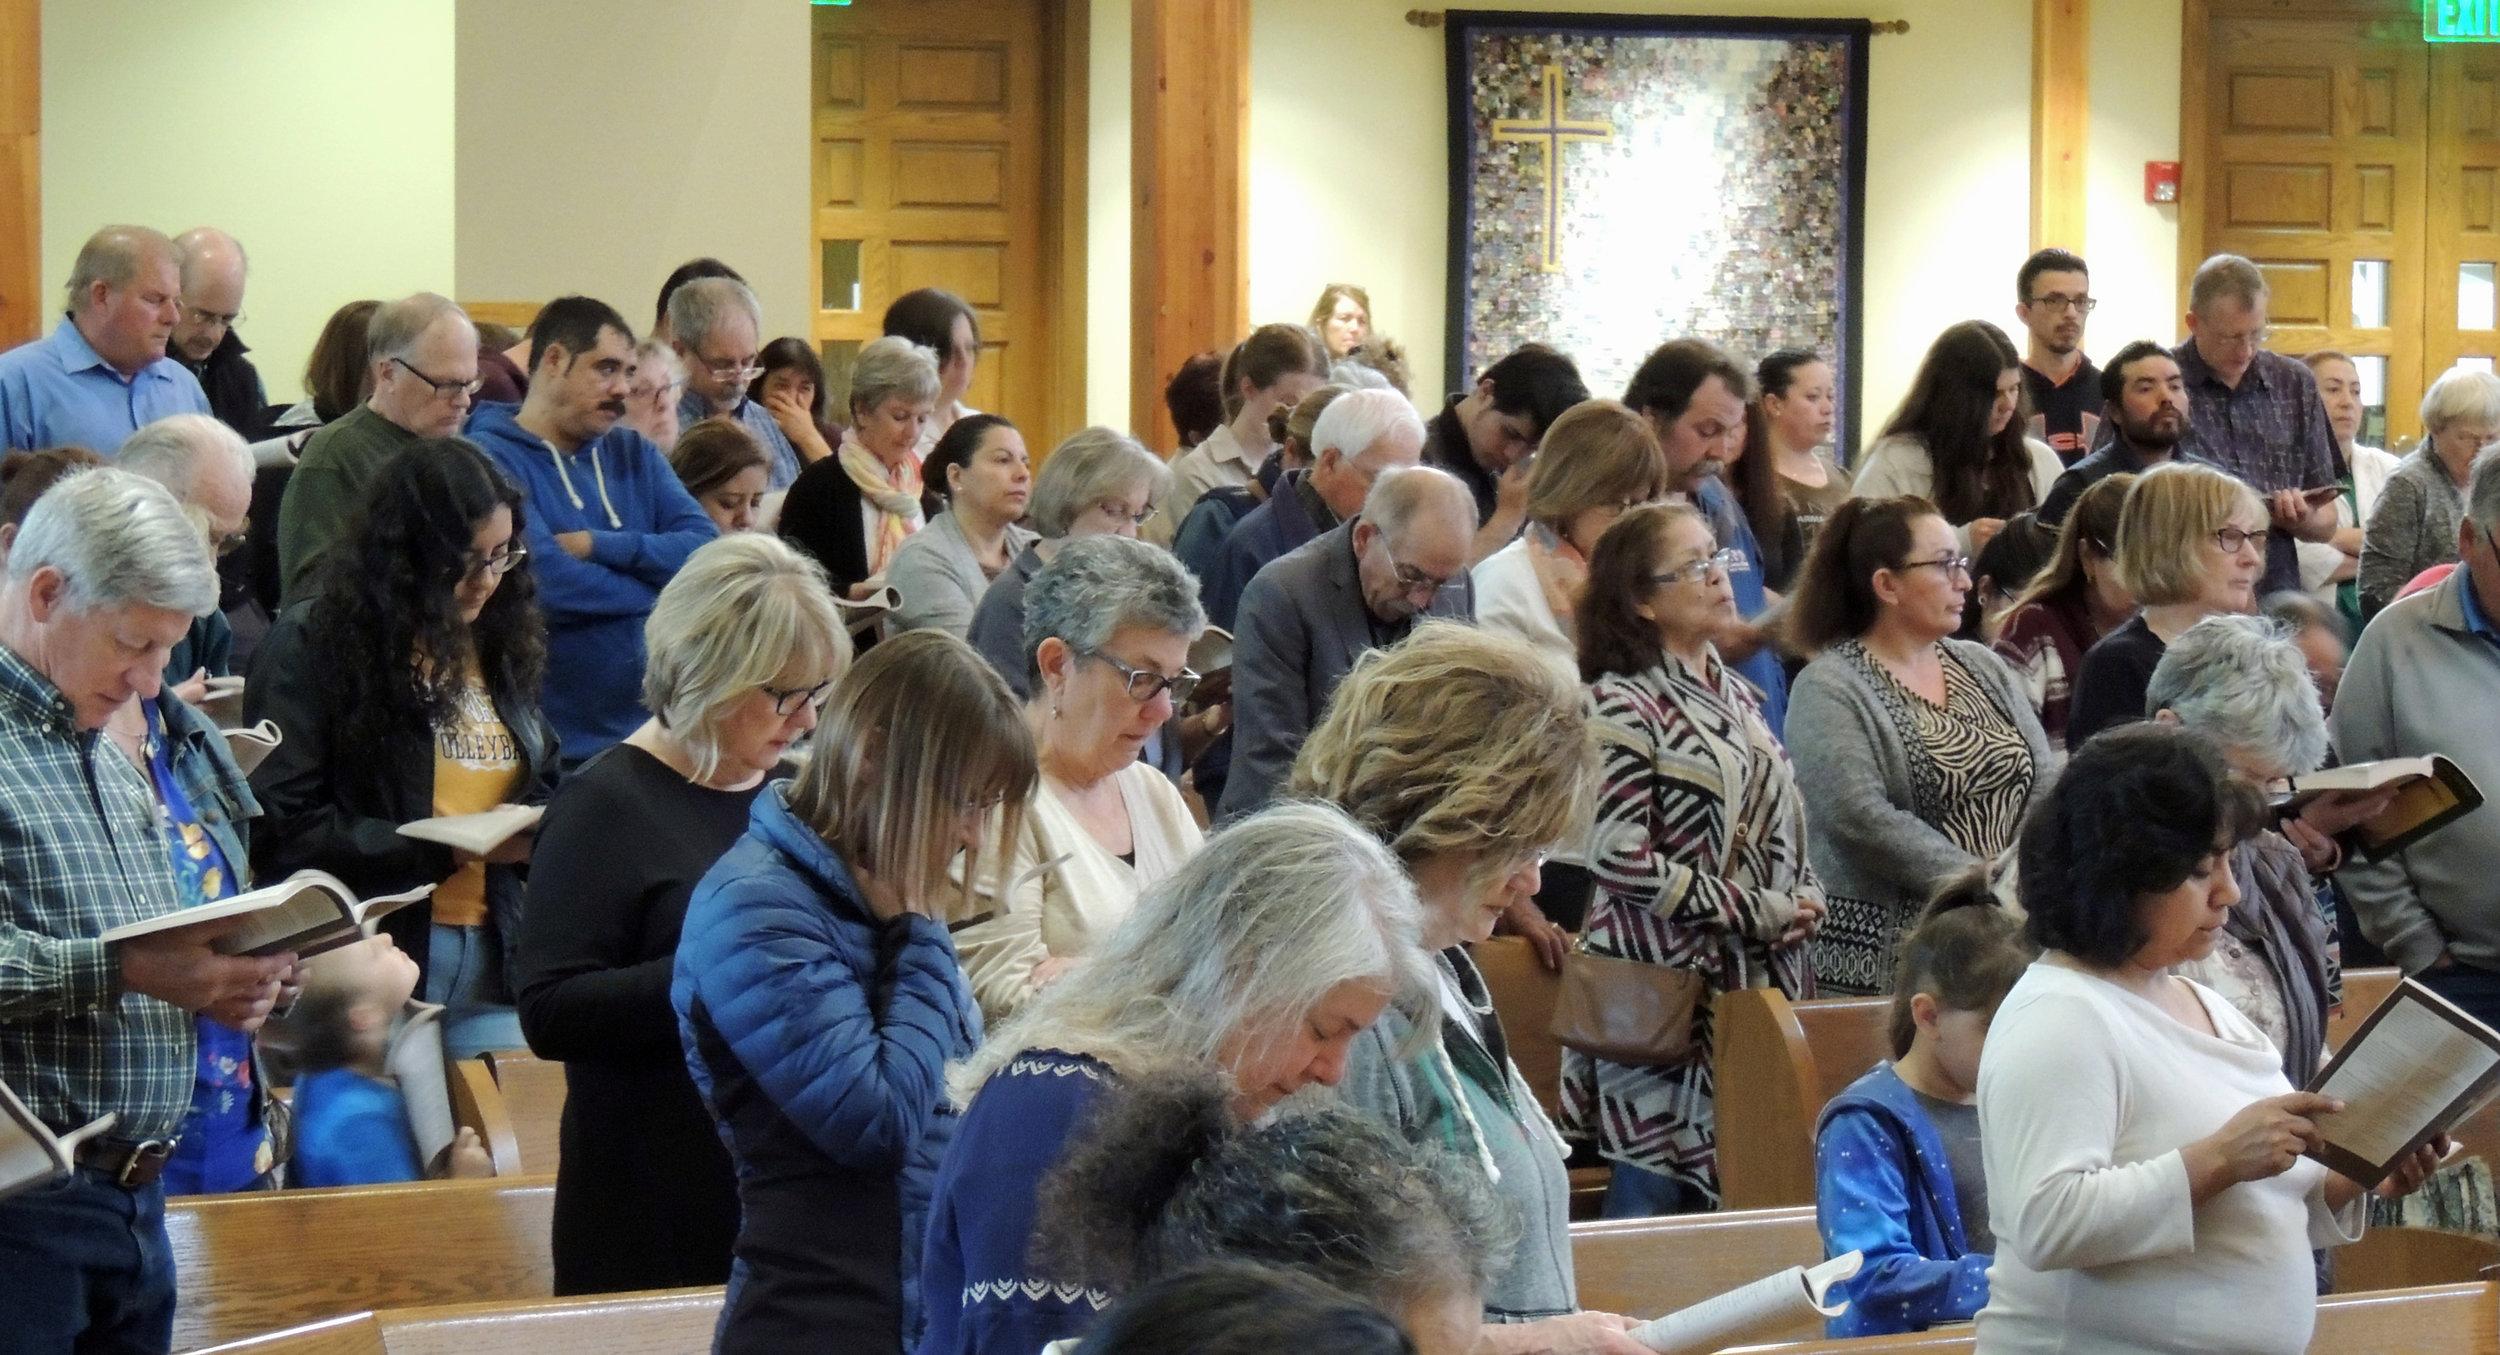 2019-0419-14-Congregation.JPG